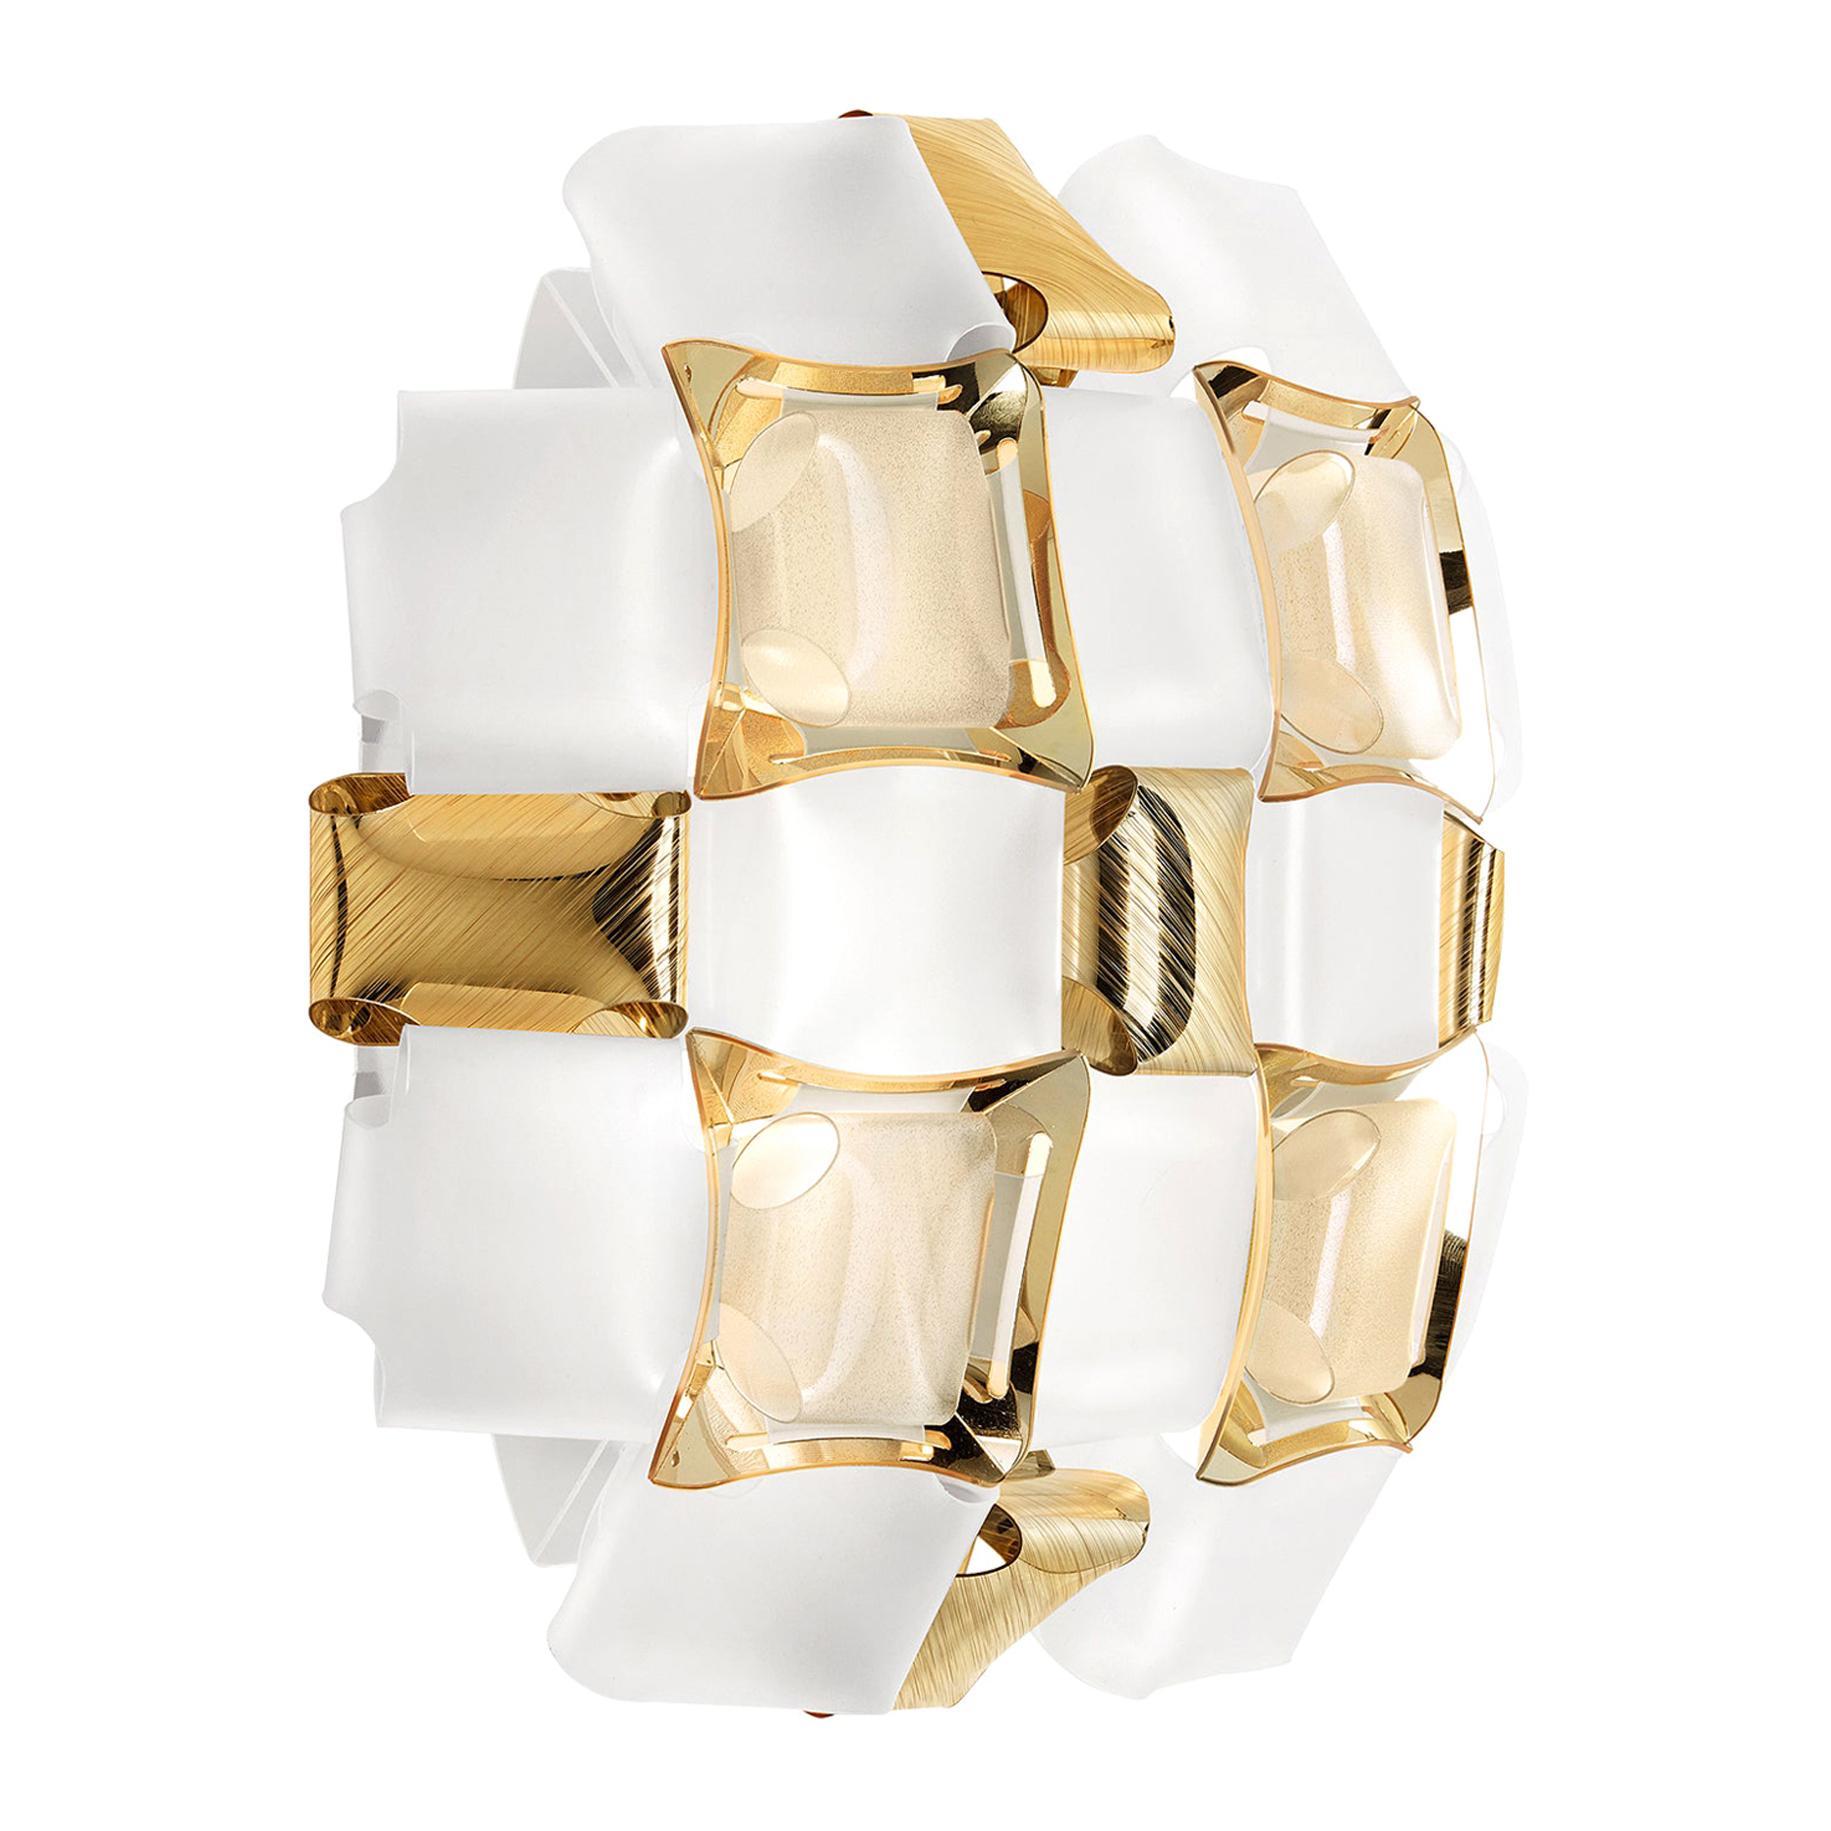 Slamp Mida Applique White/Gold by Adriano Rachele